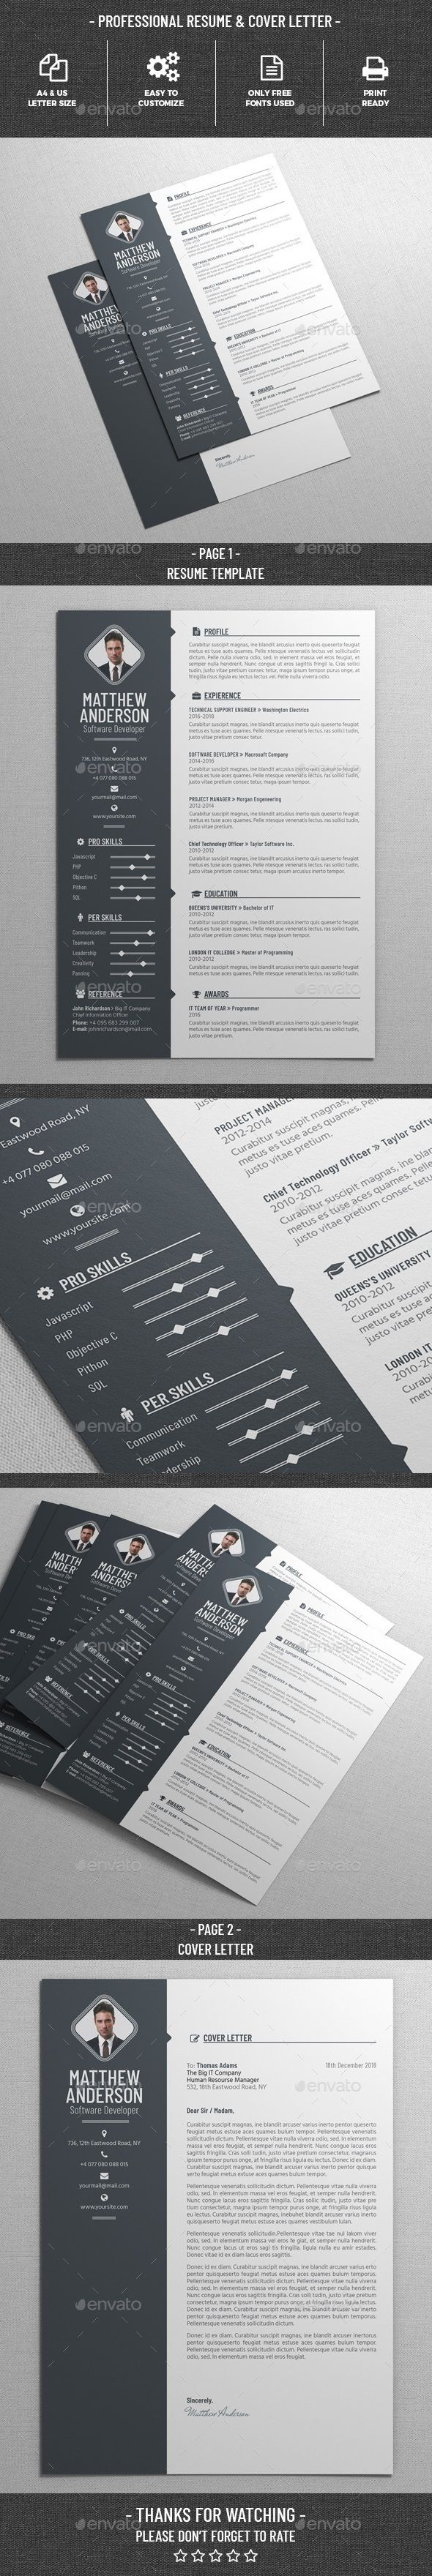 Resume cv template design Best 1223 Curriculum